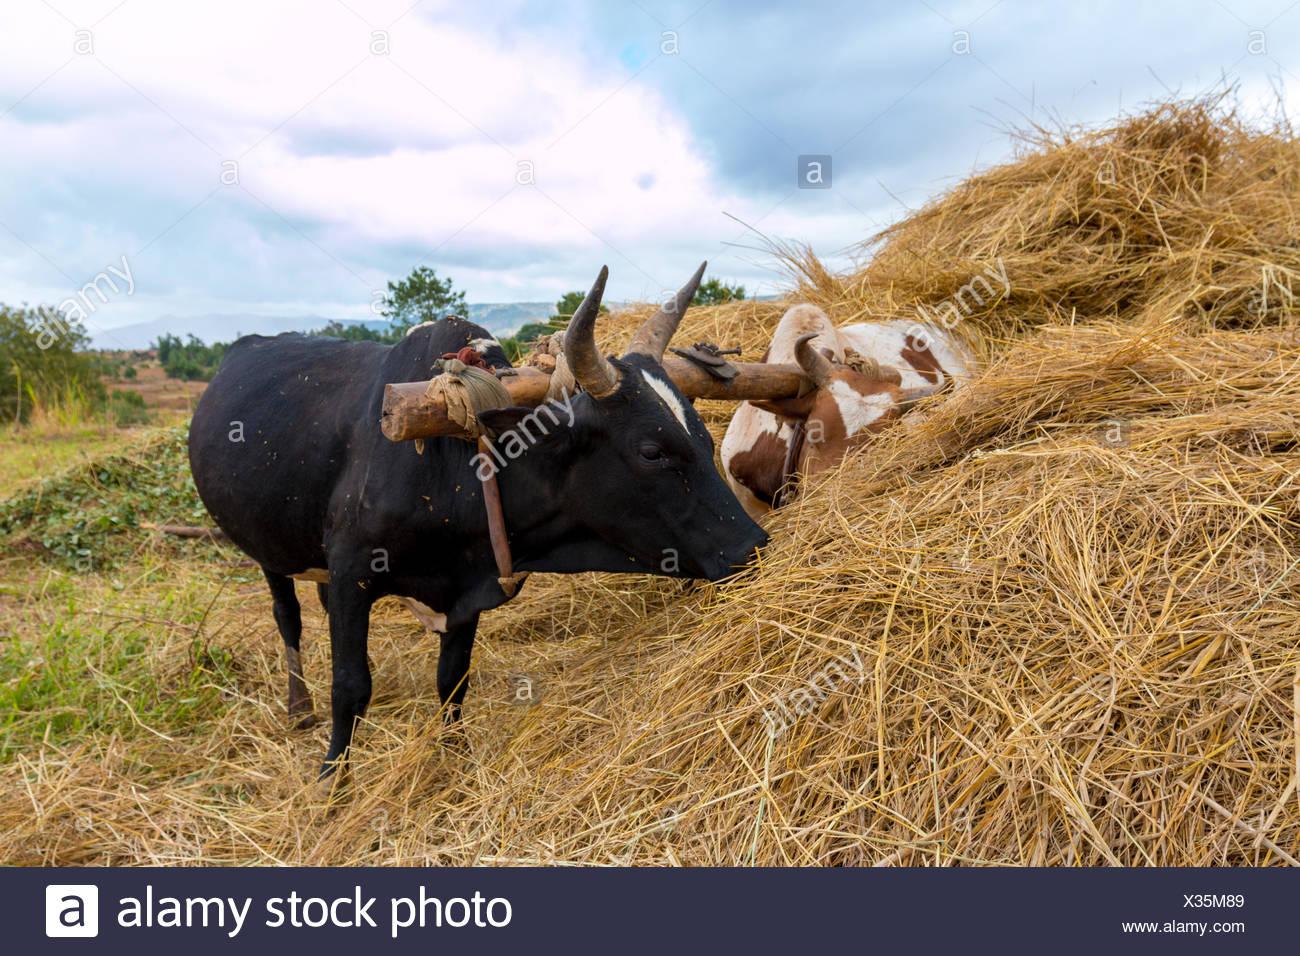 Yoke of oxen - Stock Image